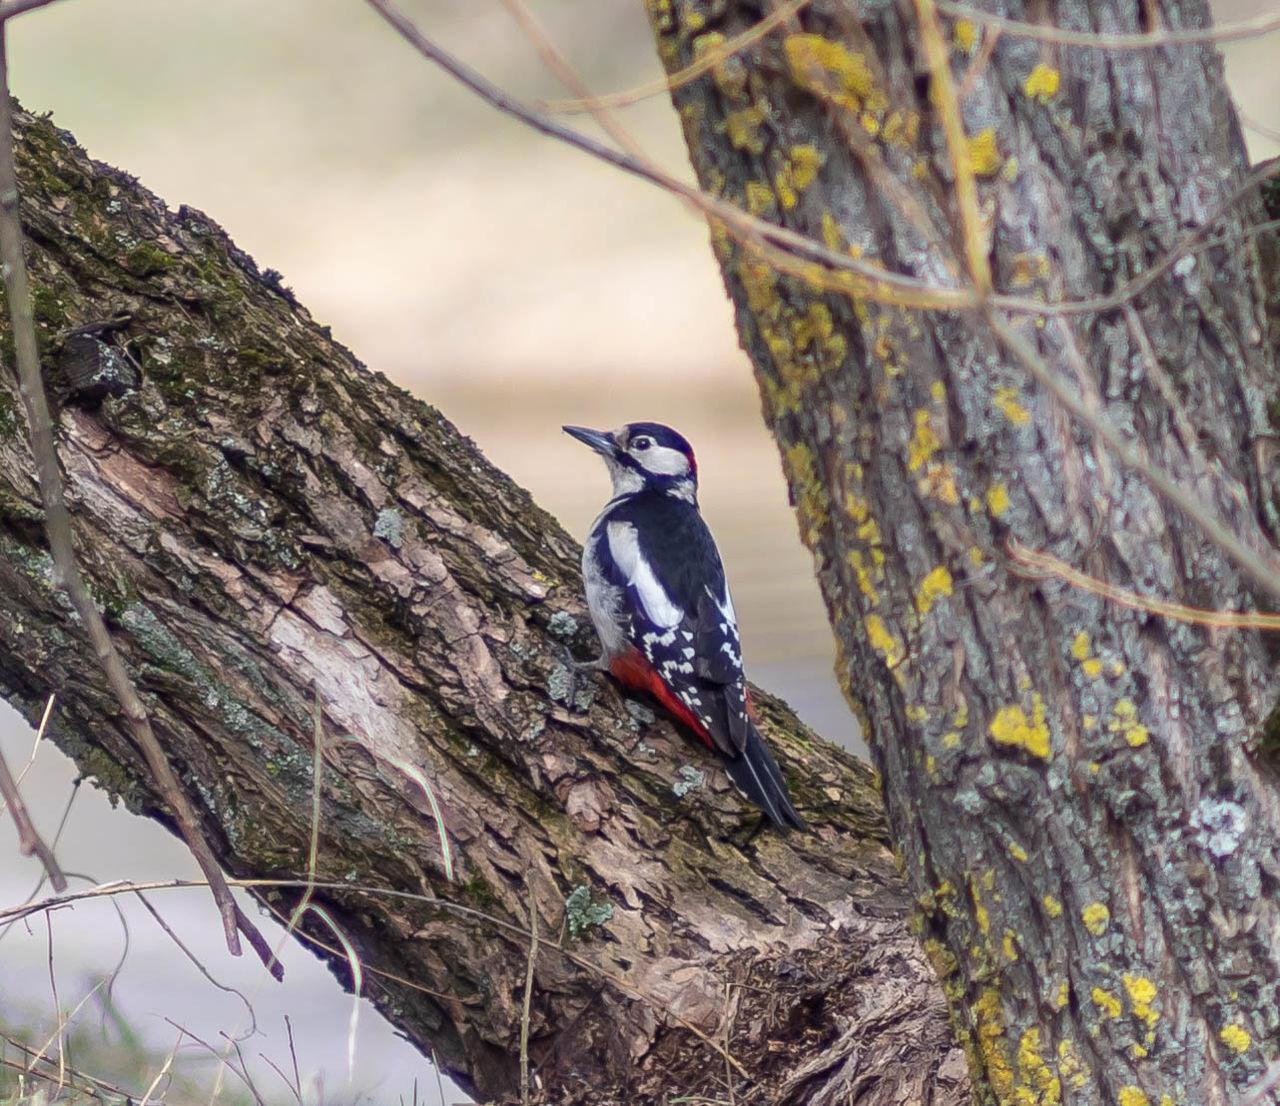 BIRDS PERCHING ON A TREE